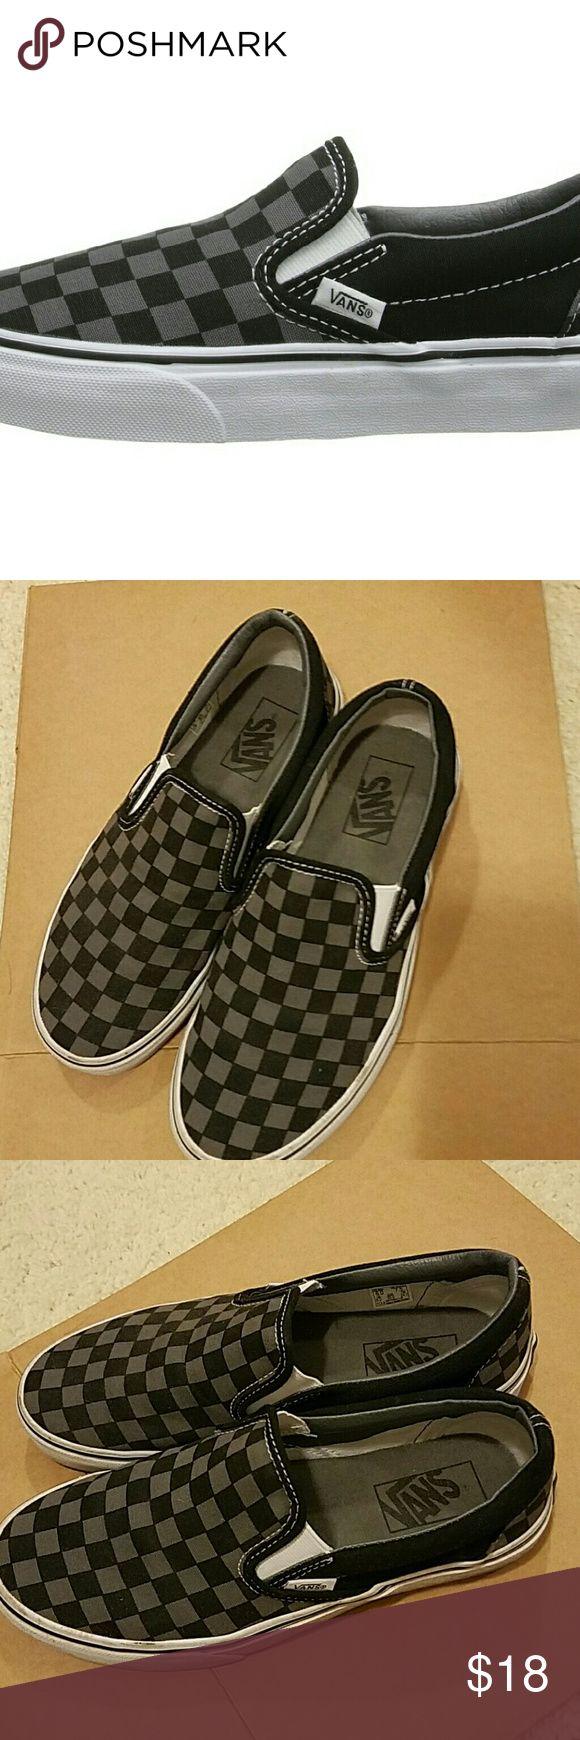 Can i buy vans for cheap mens vans slip on shoes vans on the wall - Vans Classic Checkered Slip Ons Vans Classic Checkered Slip On Shoes Black Grey